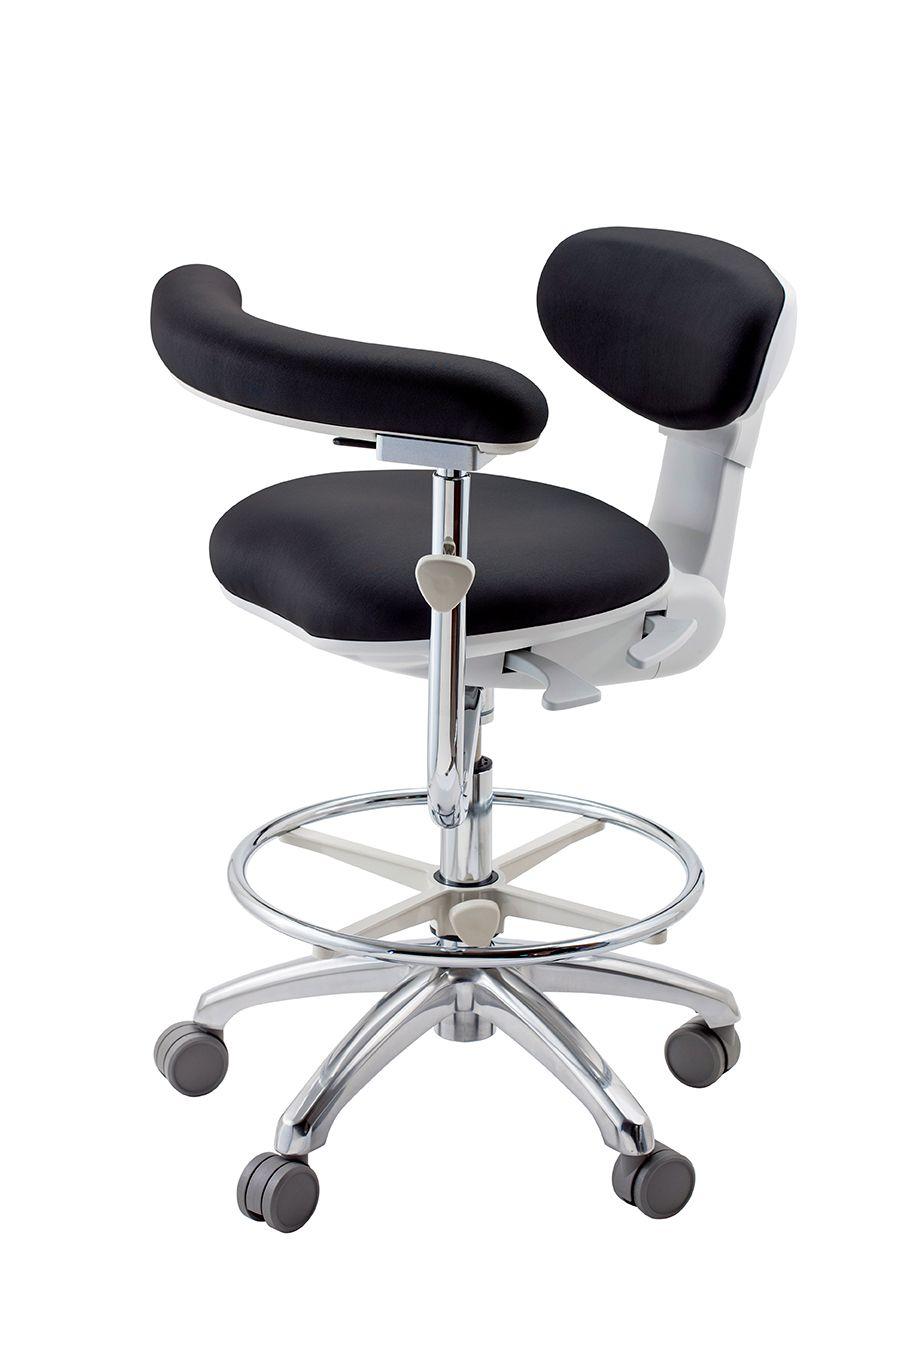 Bodyguard pro assistant capisco chair dental chair